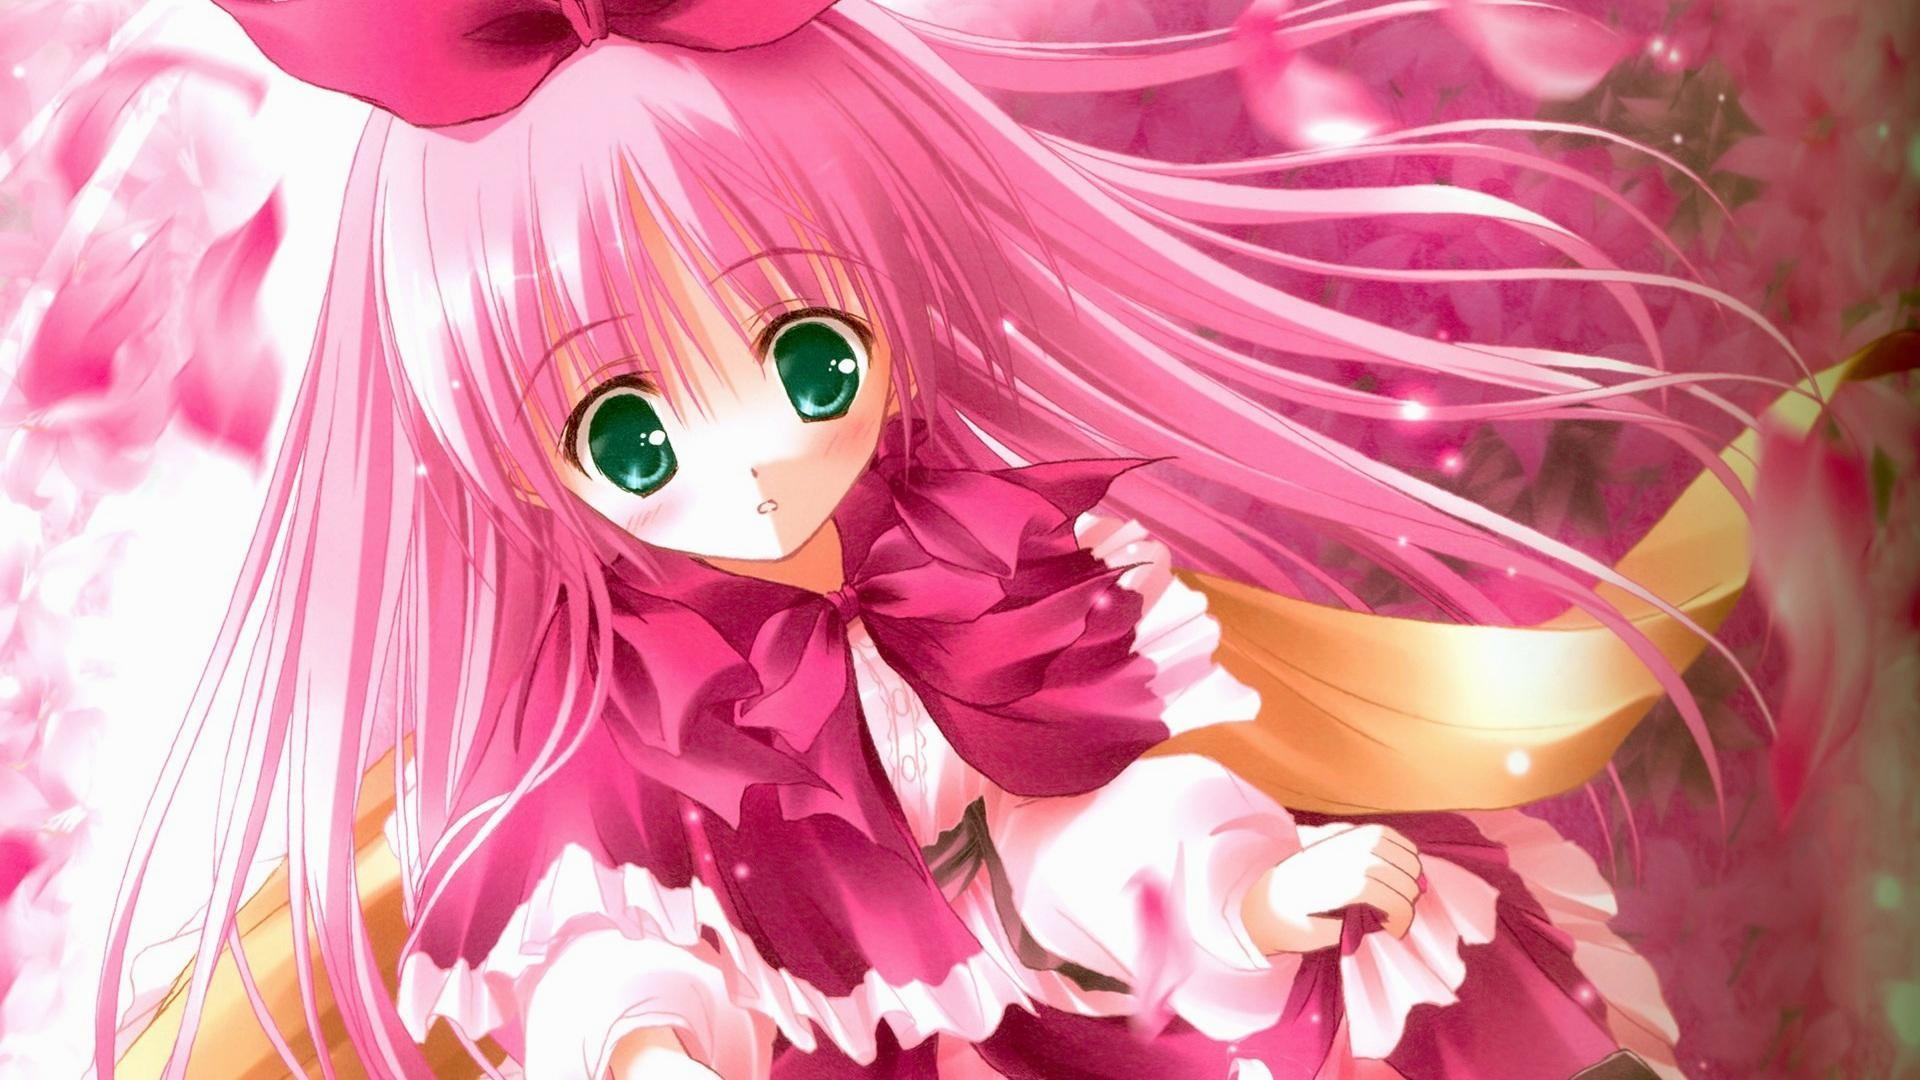 Cute-pink-hair-anime-girl-wallpapers-1920×1080